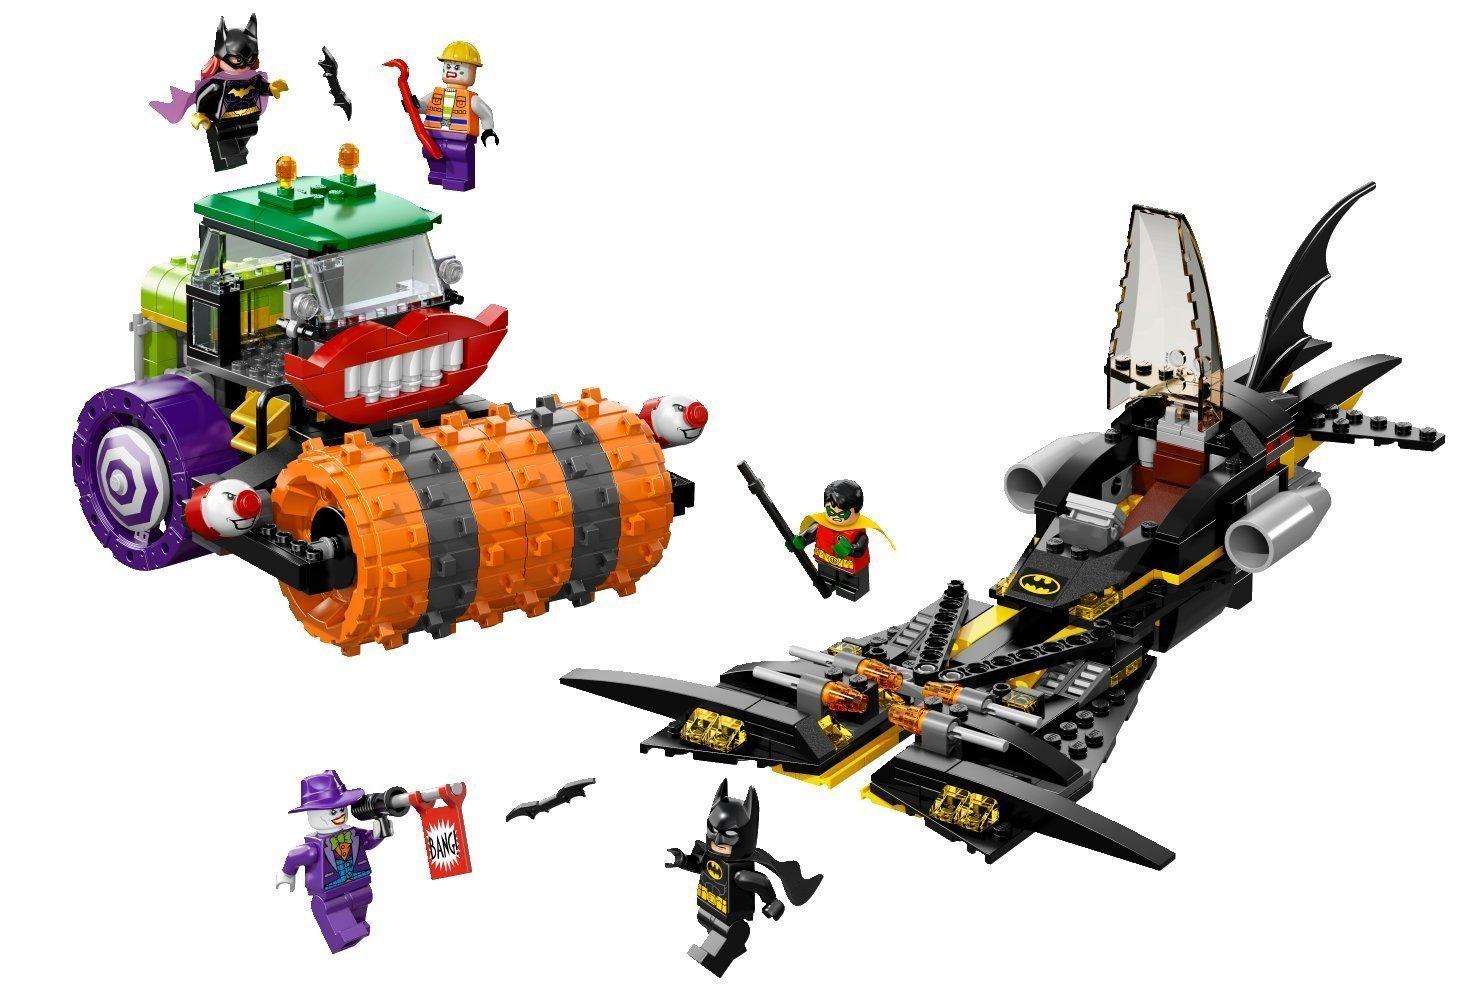 Lego super heroes 76013 batman jokers dampfroller miwarz for Roller potsdam